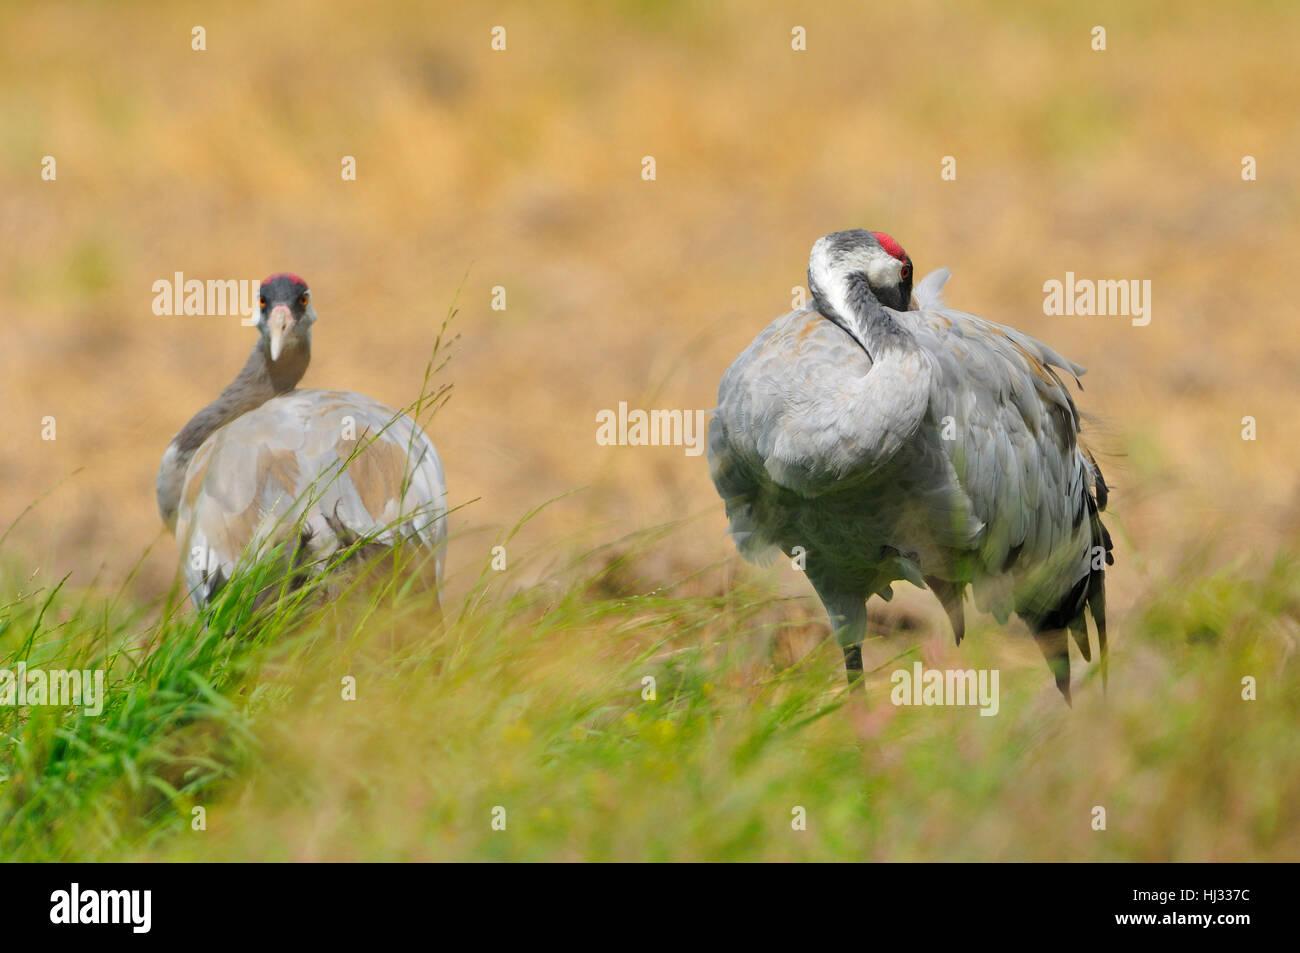 bird, birds, crane, couple, pair, break, rest, pause, bird, field, birds, Stock Photo